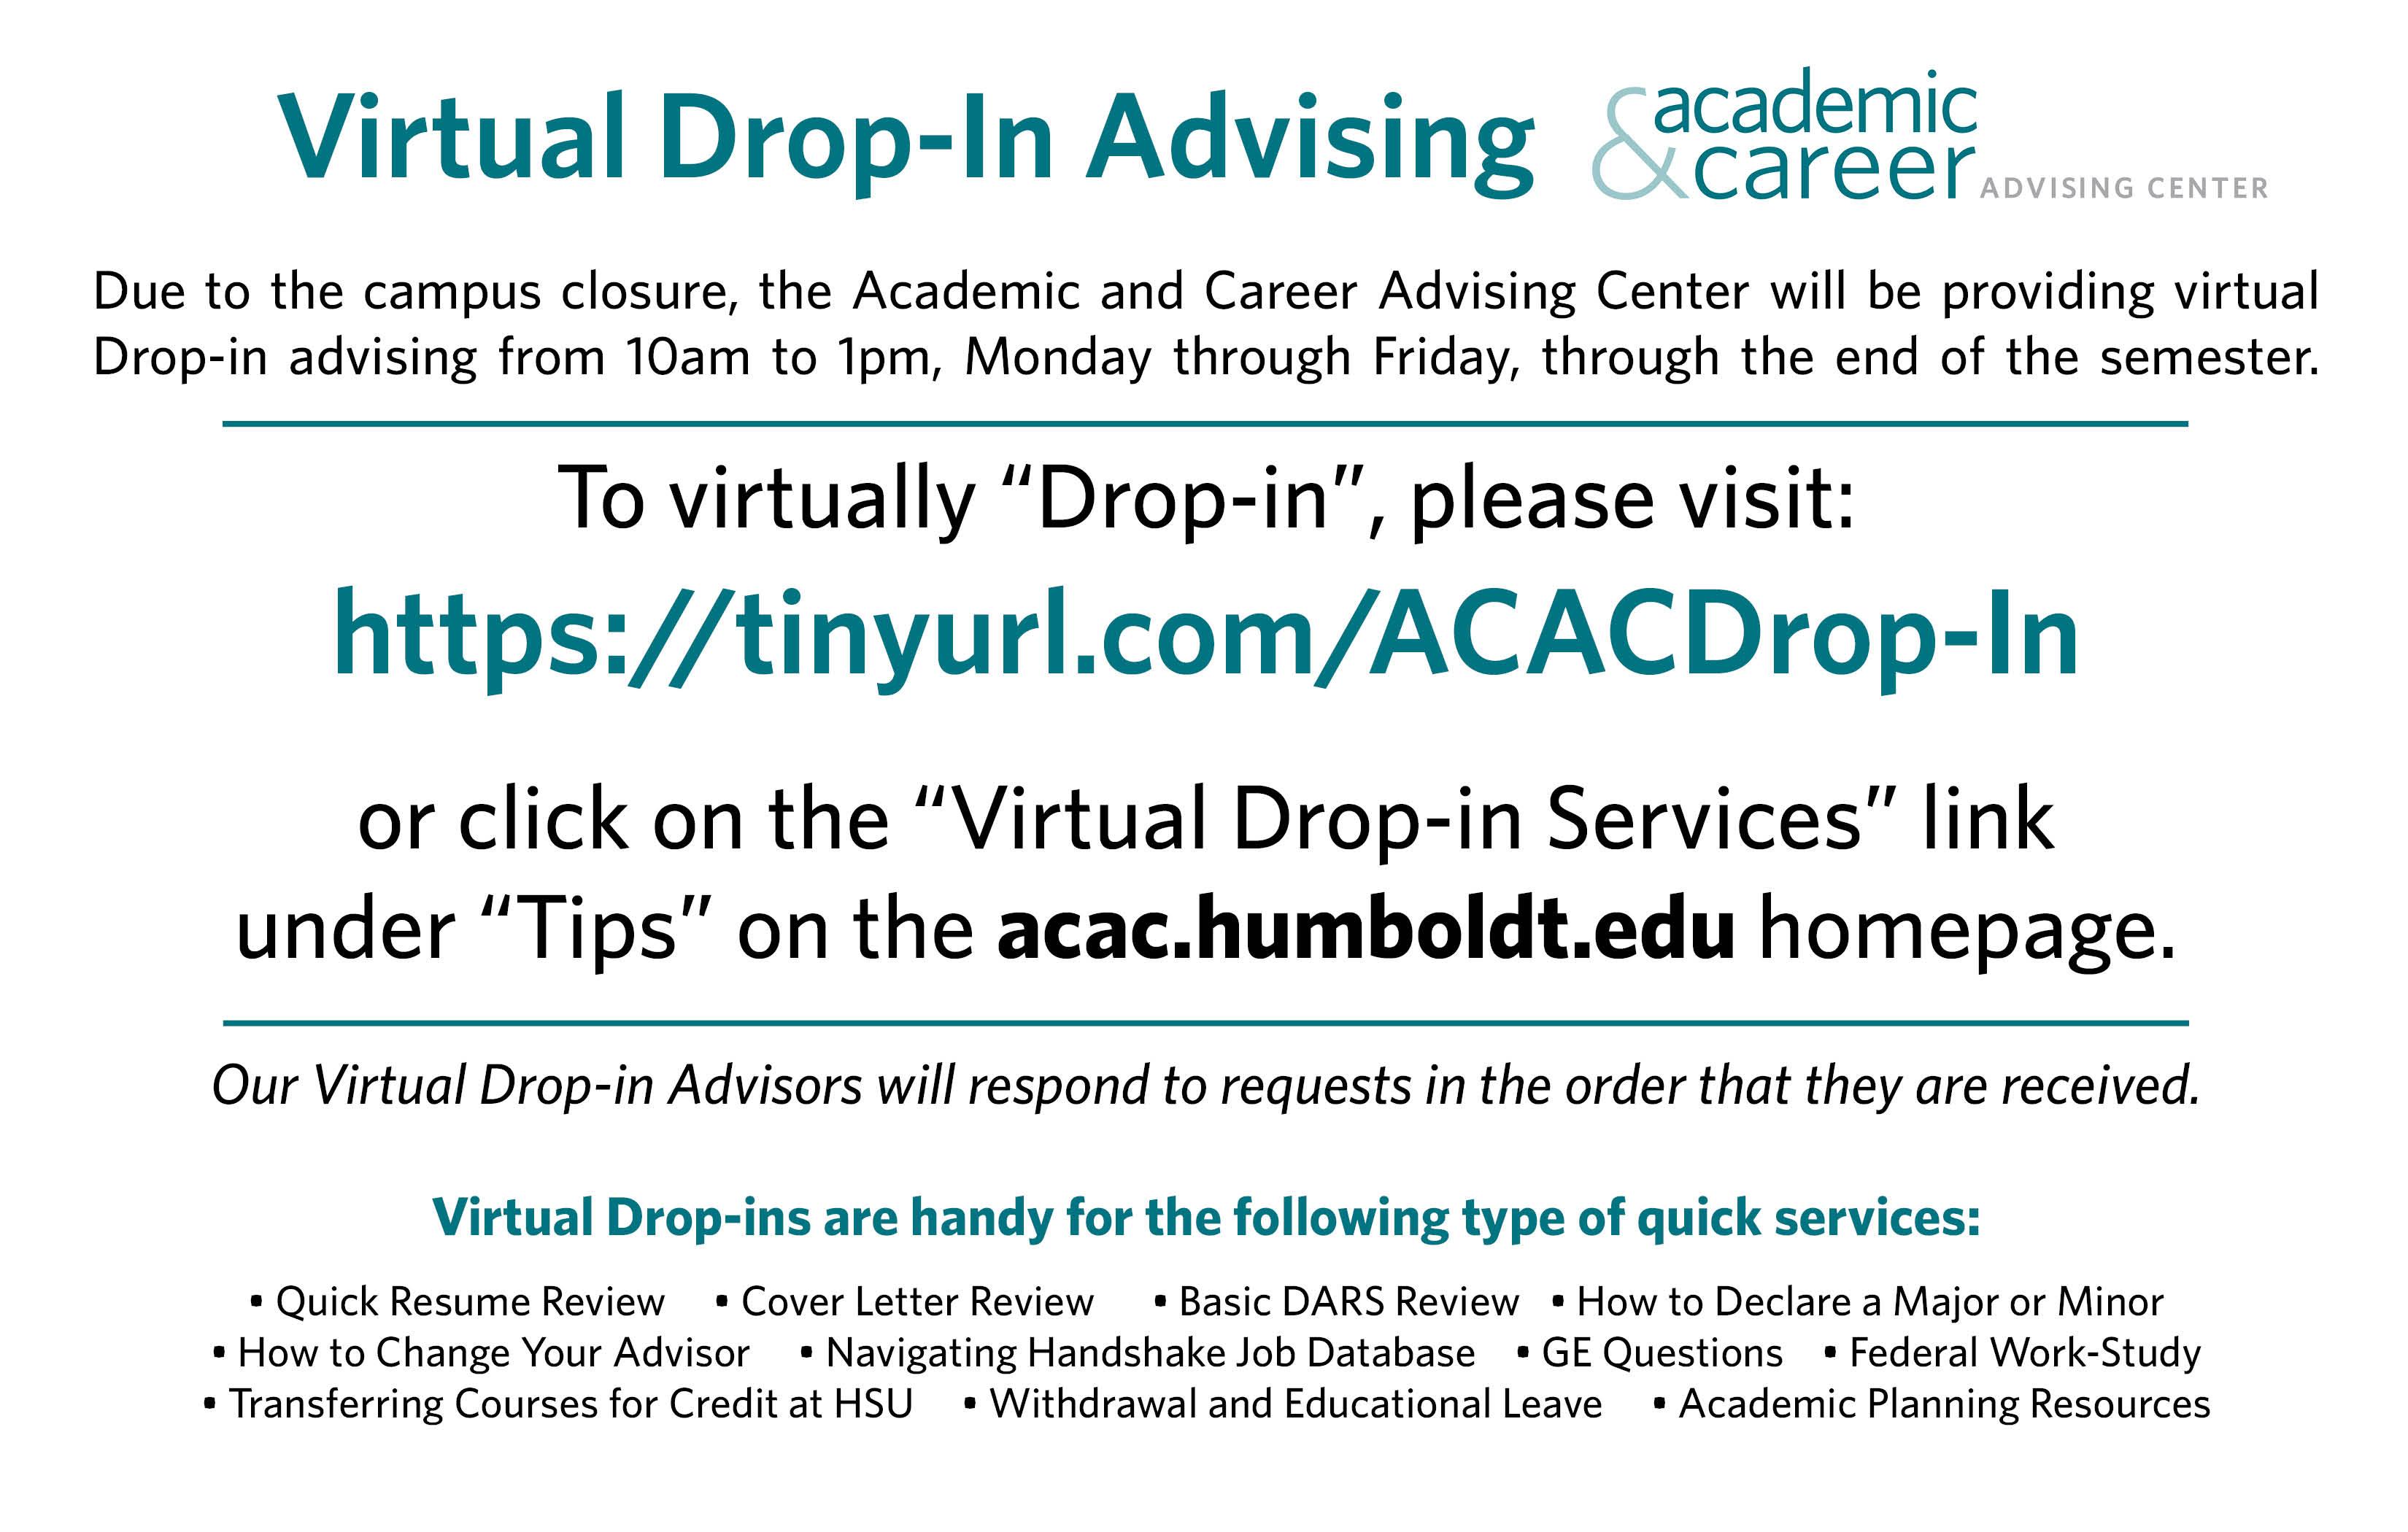 Cover Letter Academic Advisor from acac.humboldt.edu